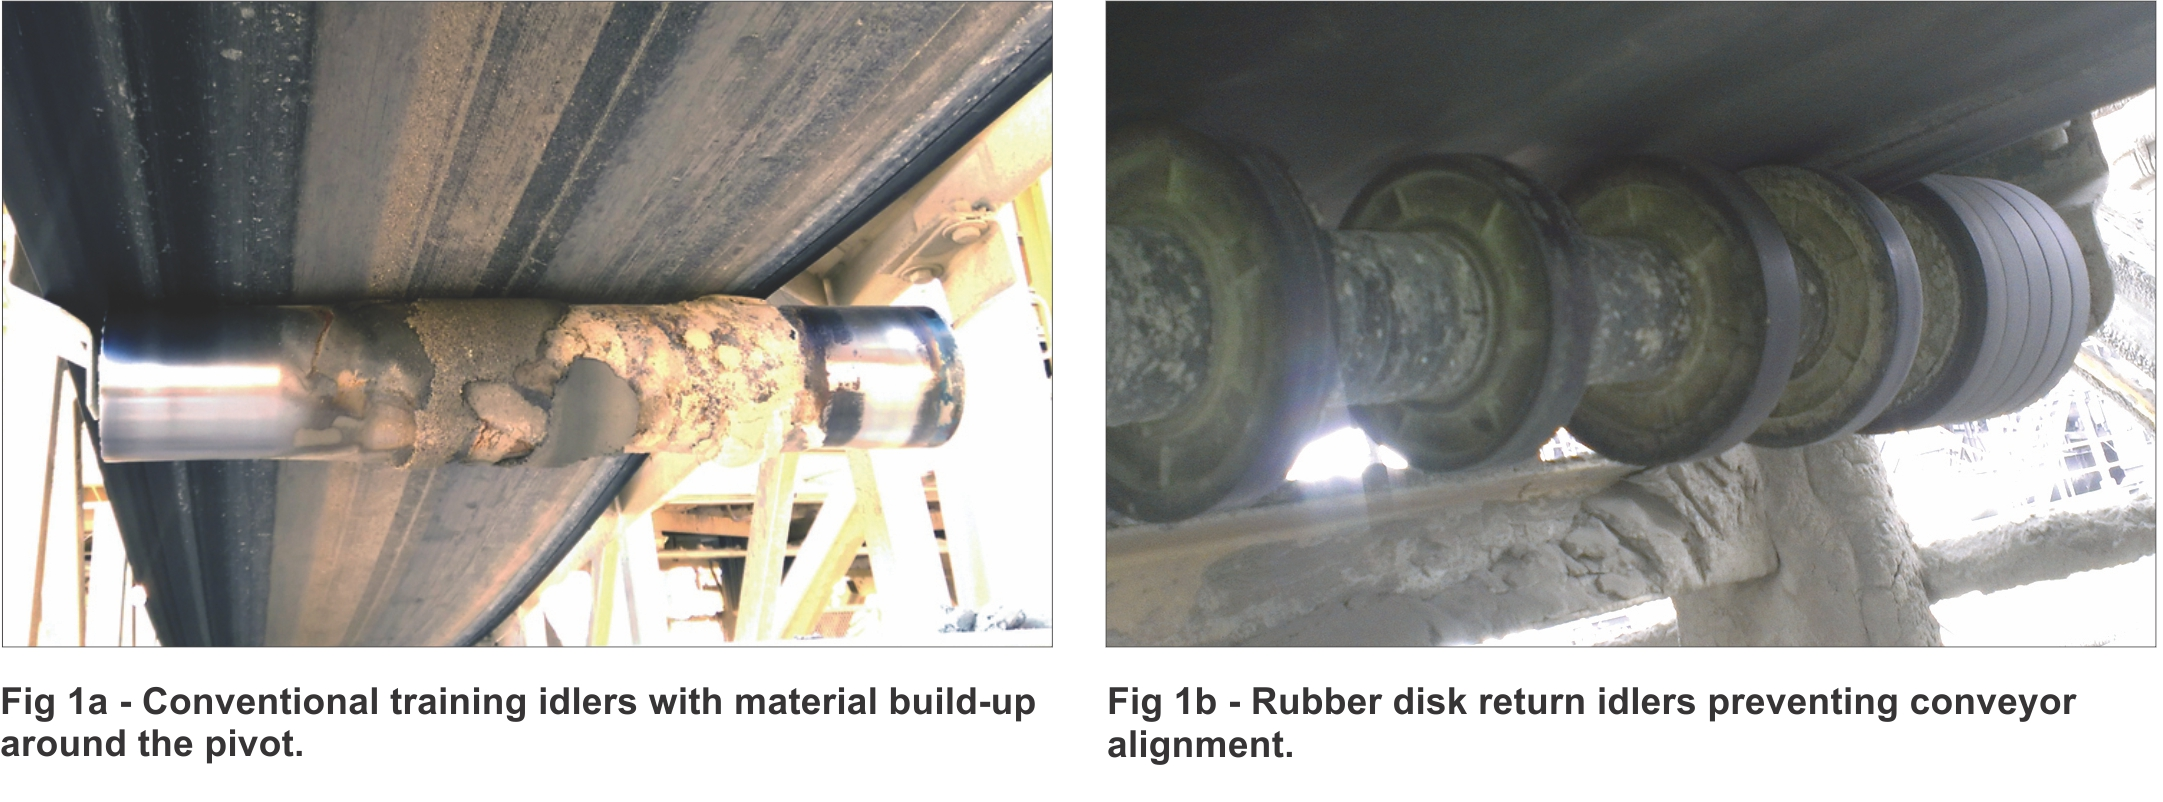 Case Study_MJ_Cement Plant_TruTrainer_Challenge Pic_web